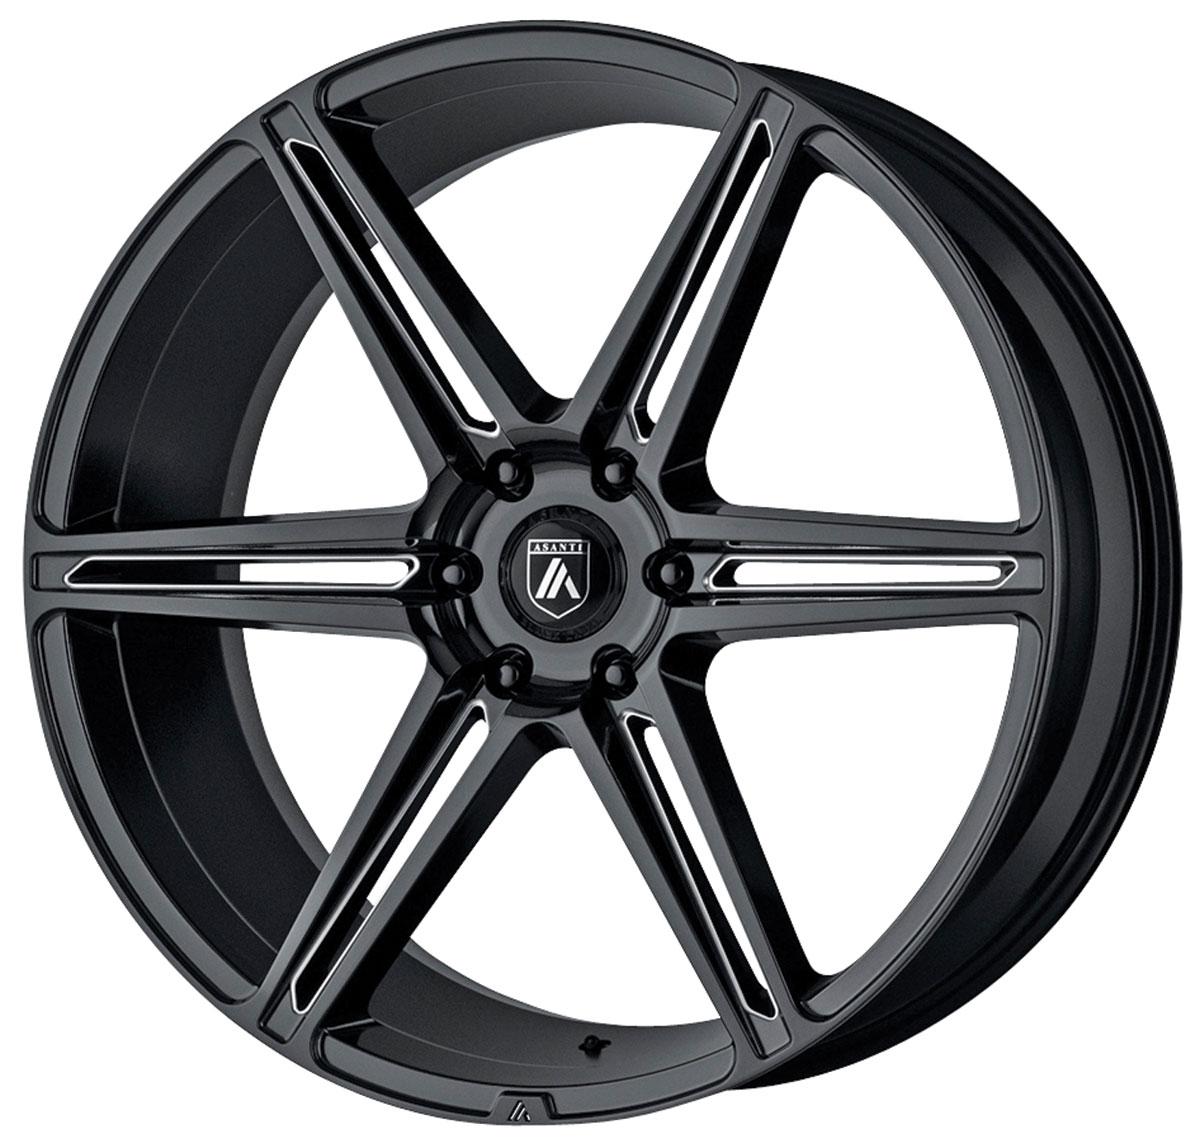 Wheel, Asanti Black Label, ABL-25 ALPHA 6, 1999-2019 Escalade, 20X9